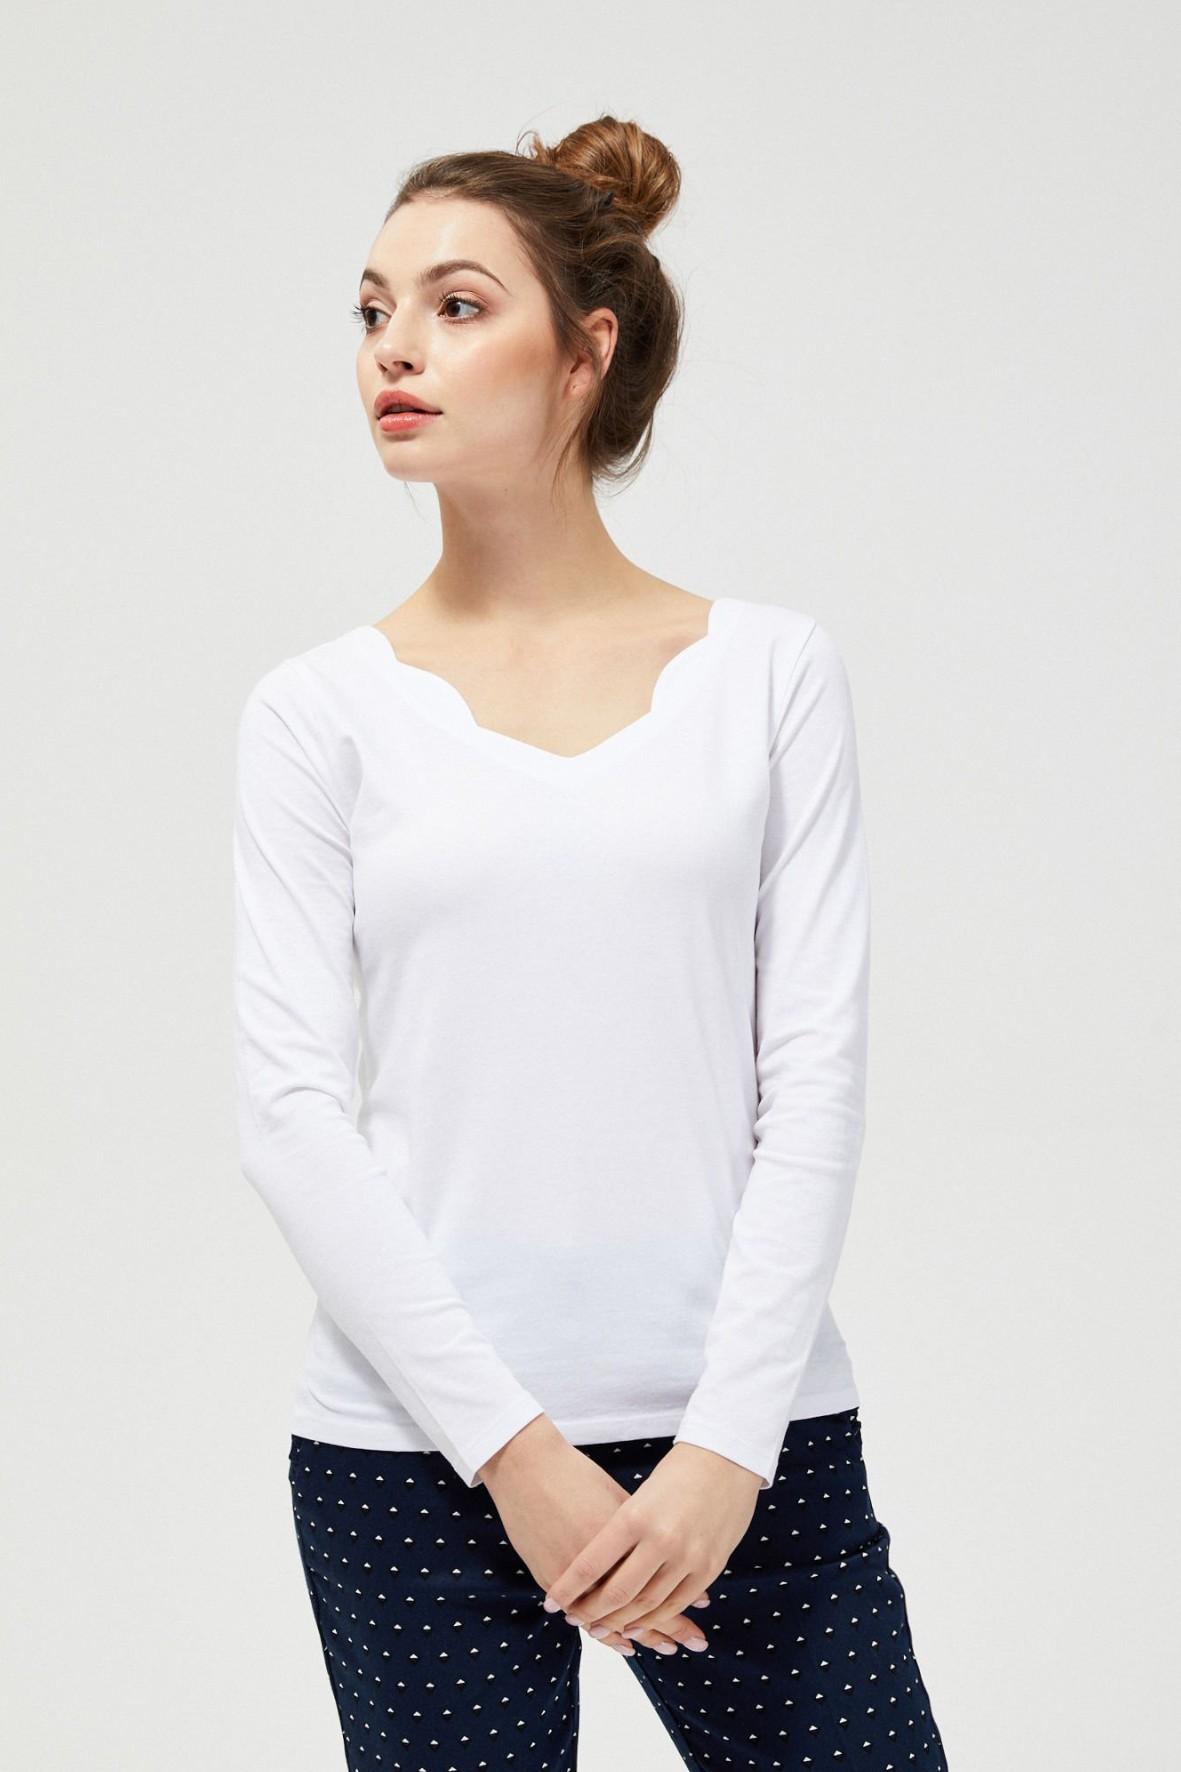 Bawełniana bluzka typu basic- biała